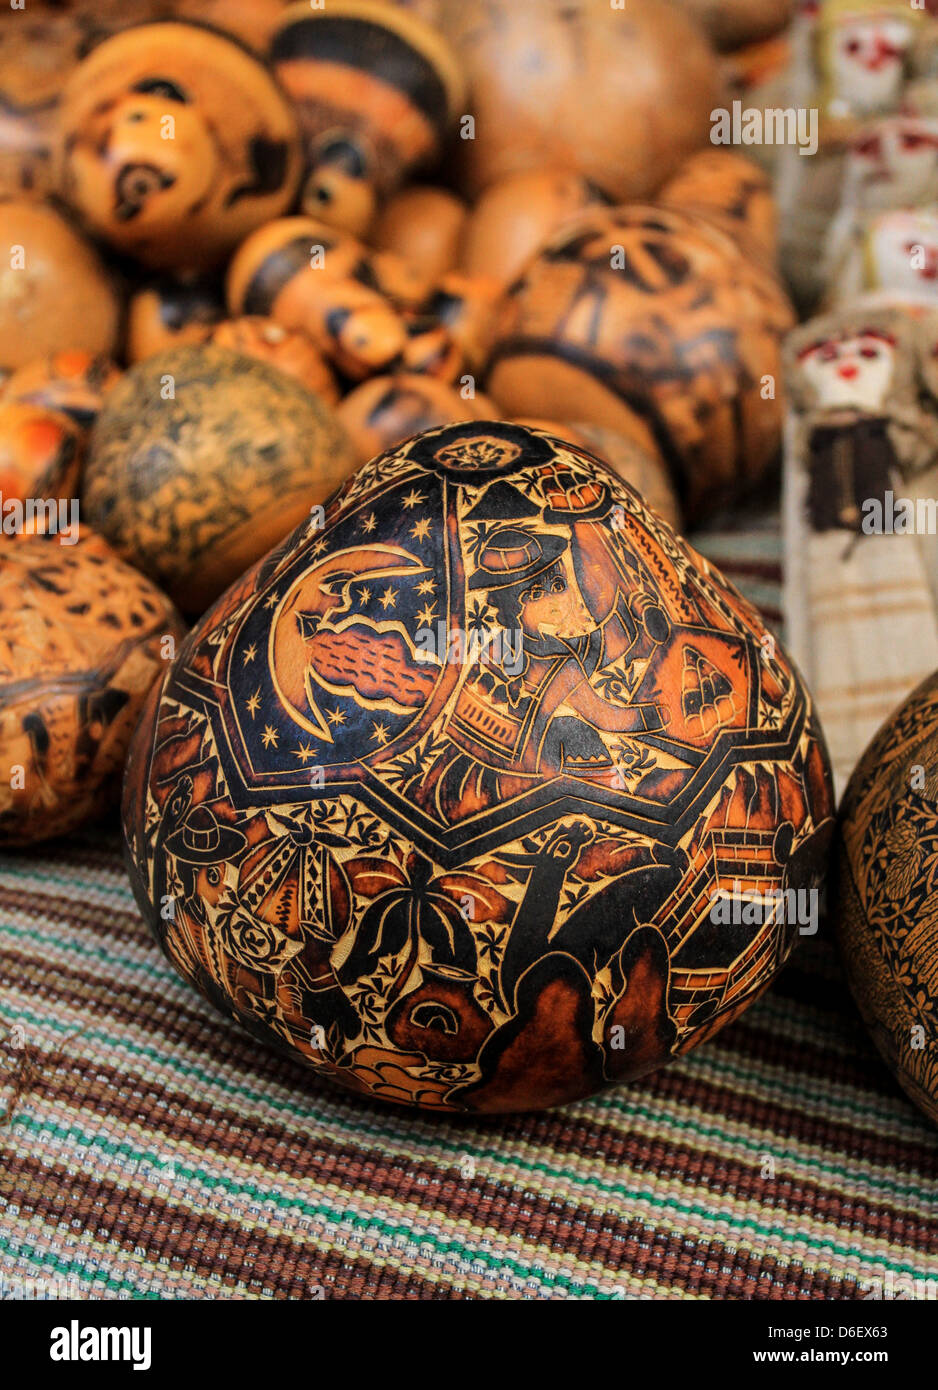 Carvings in Otavalo market, Ecuador - Stock Image